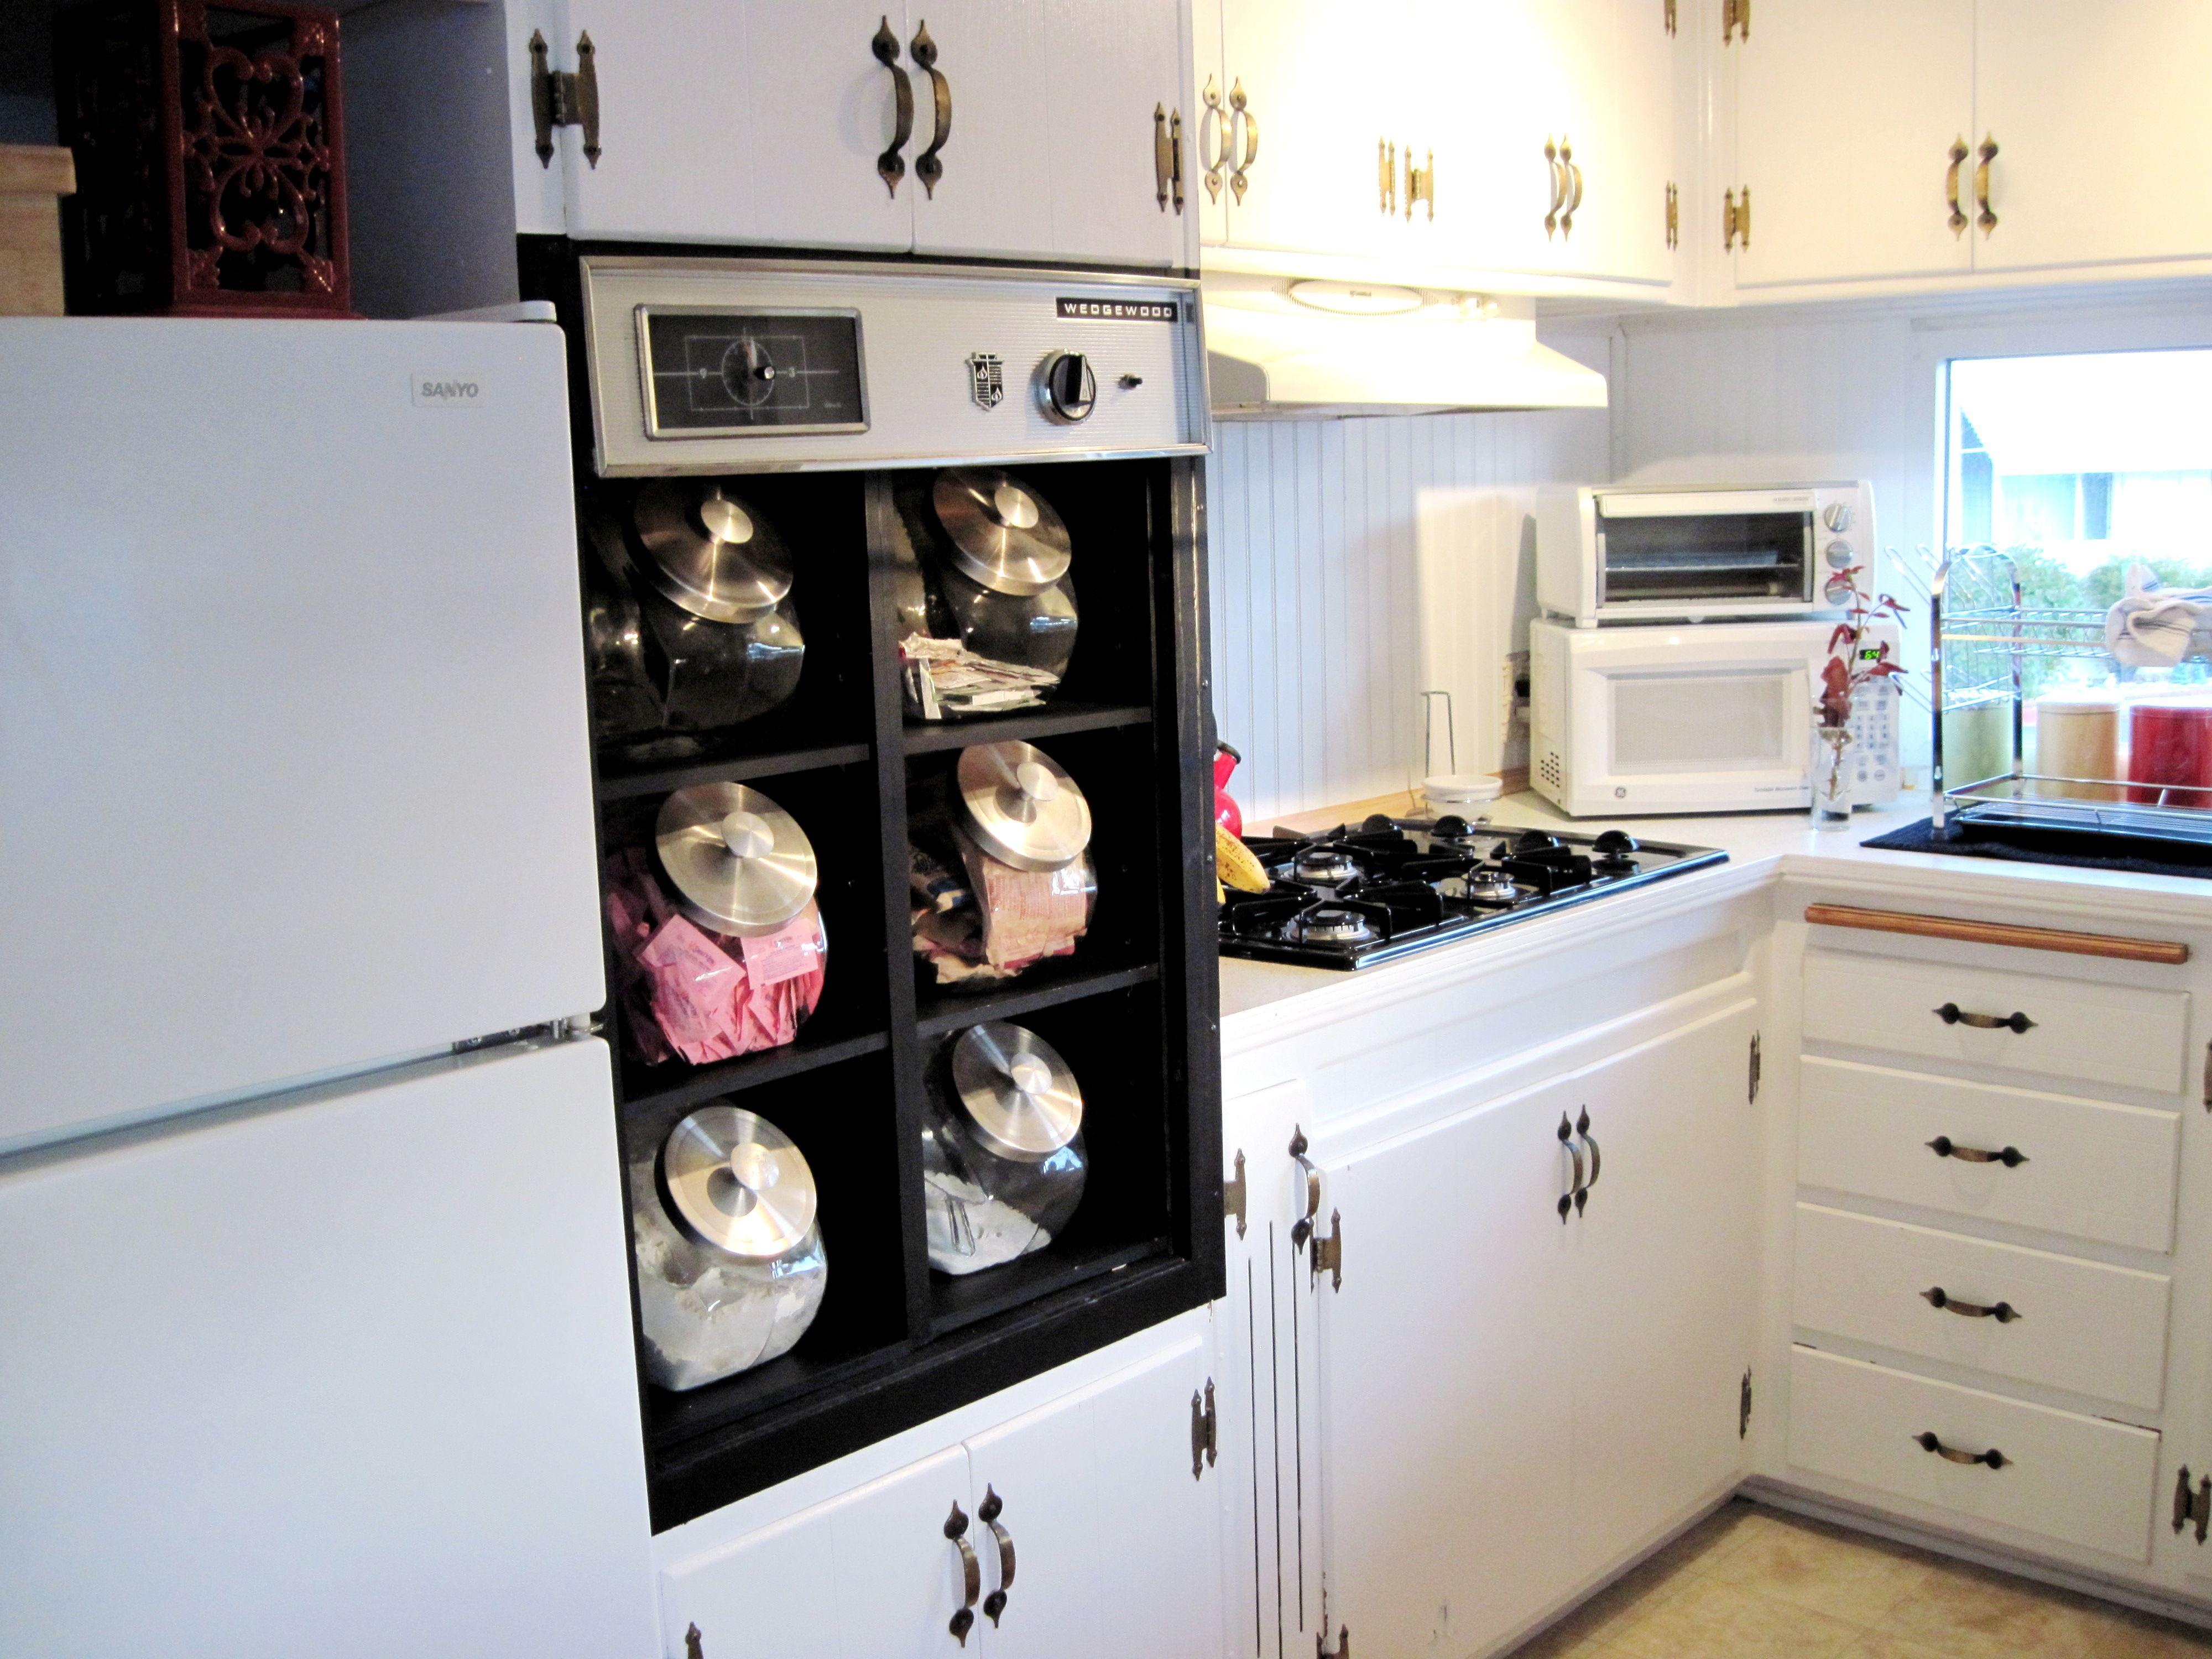 post-oven.jpg